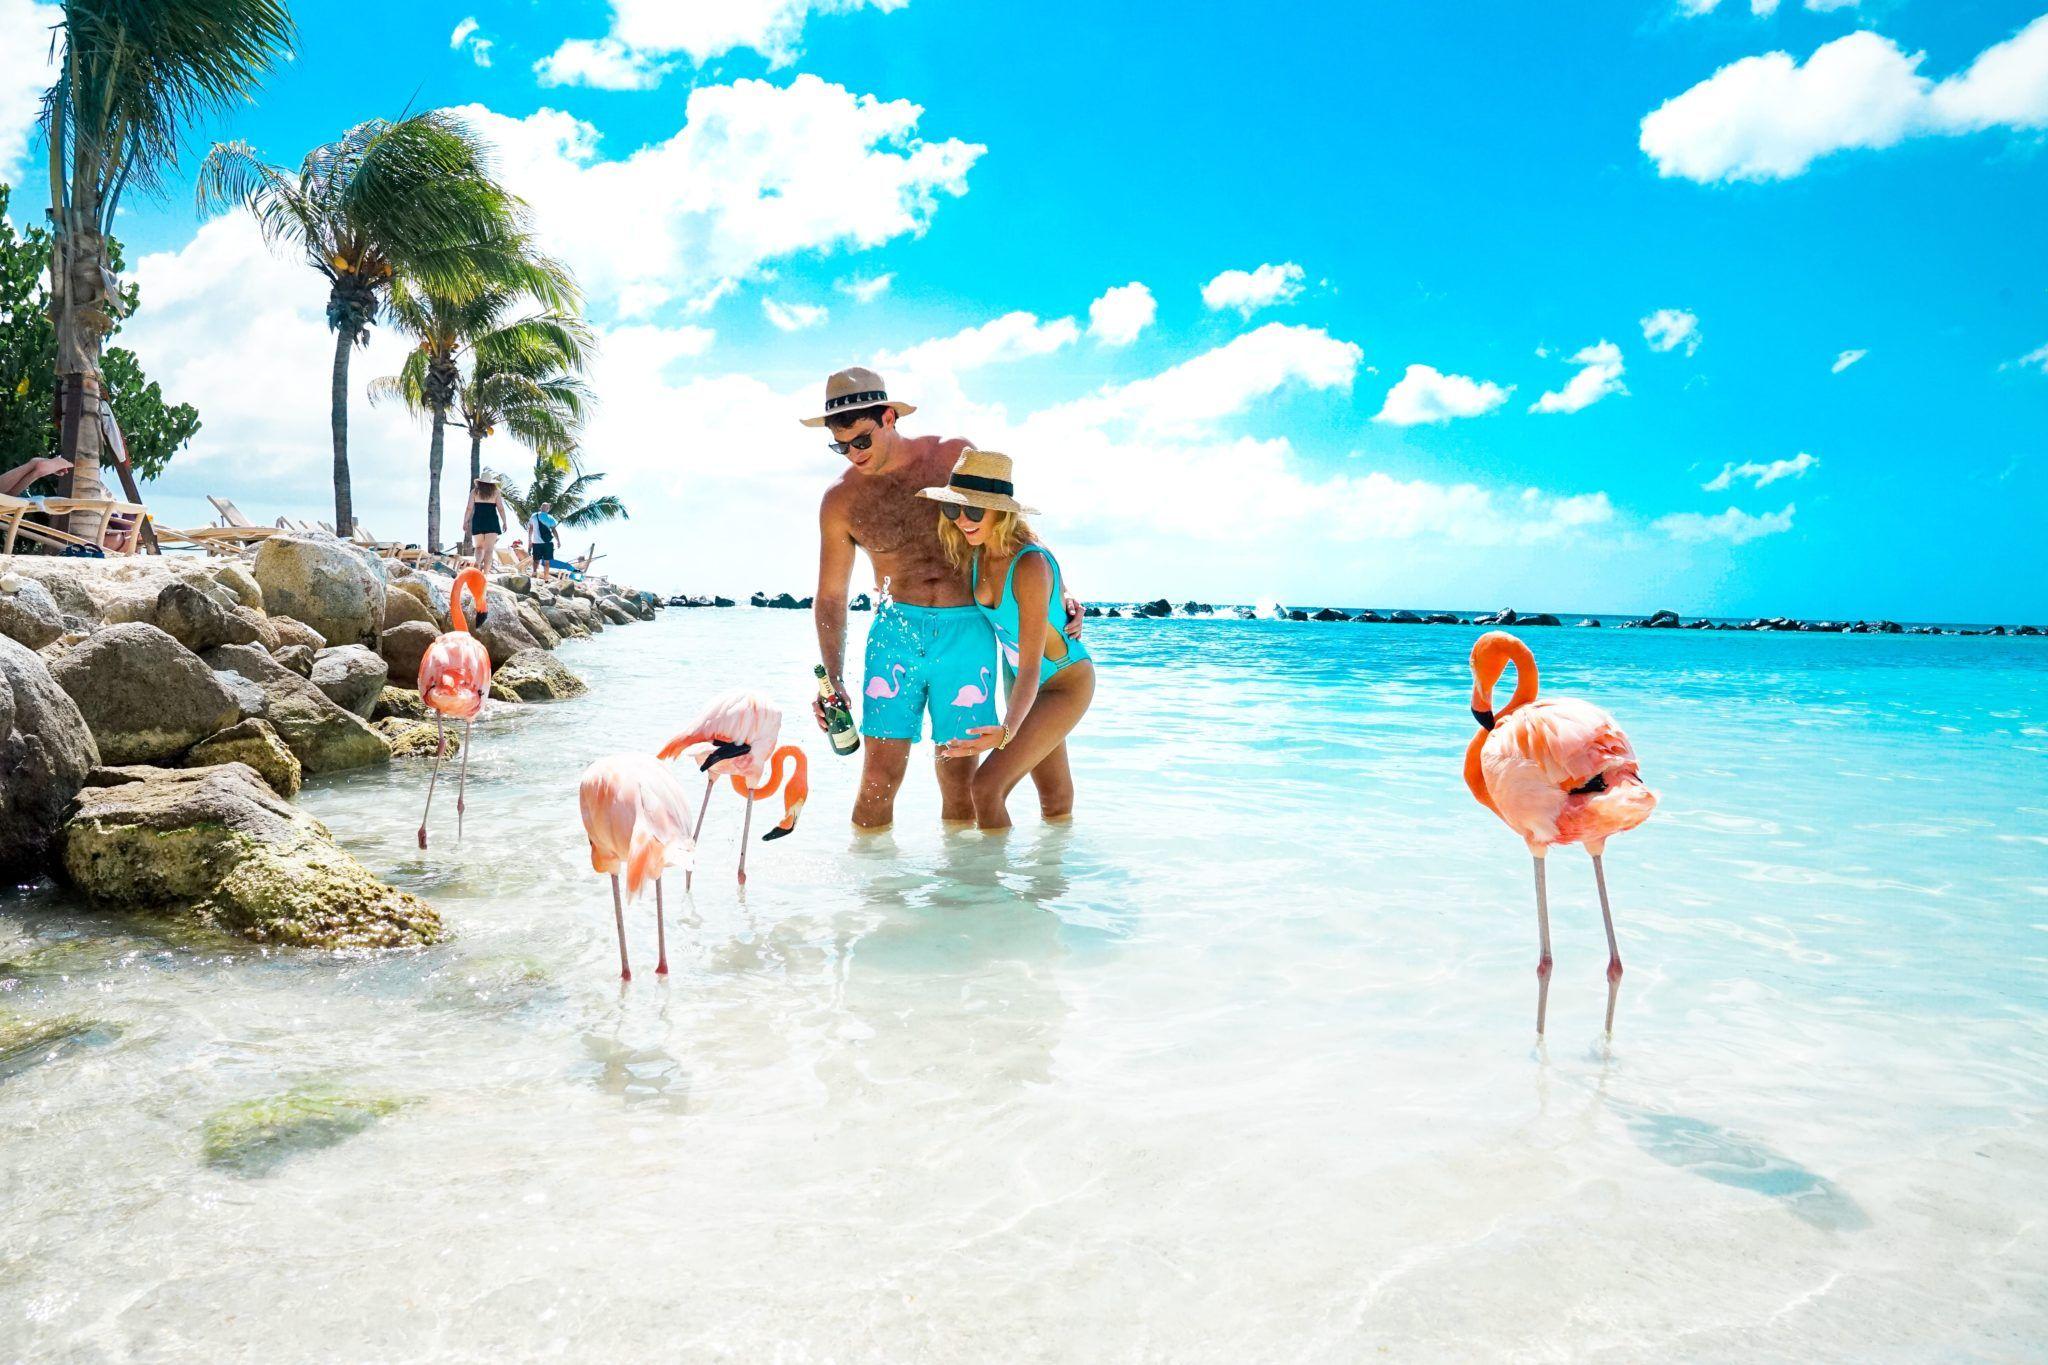 Aruba in the Caribbean